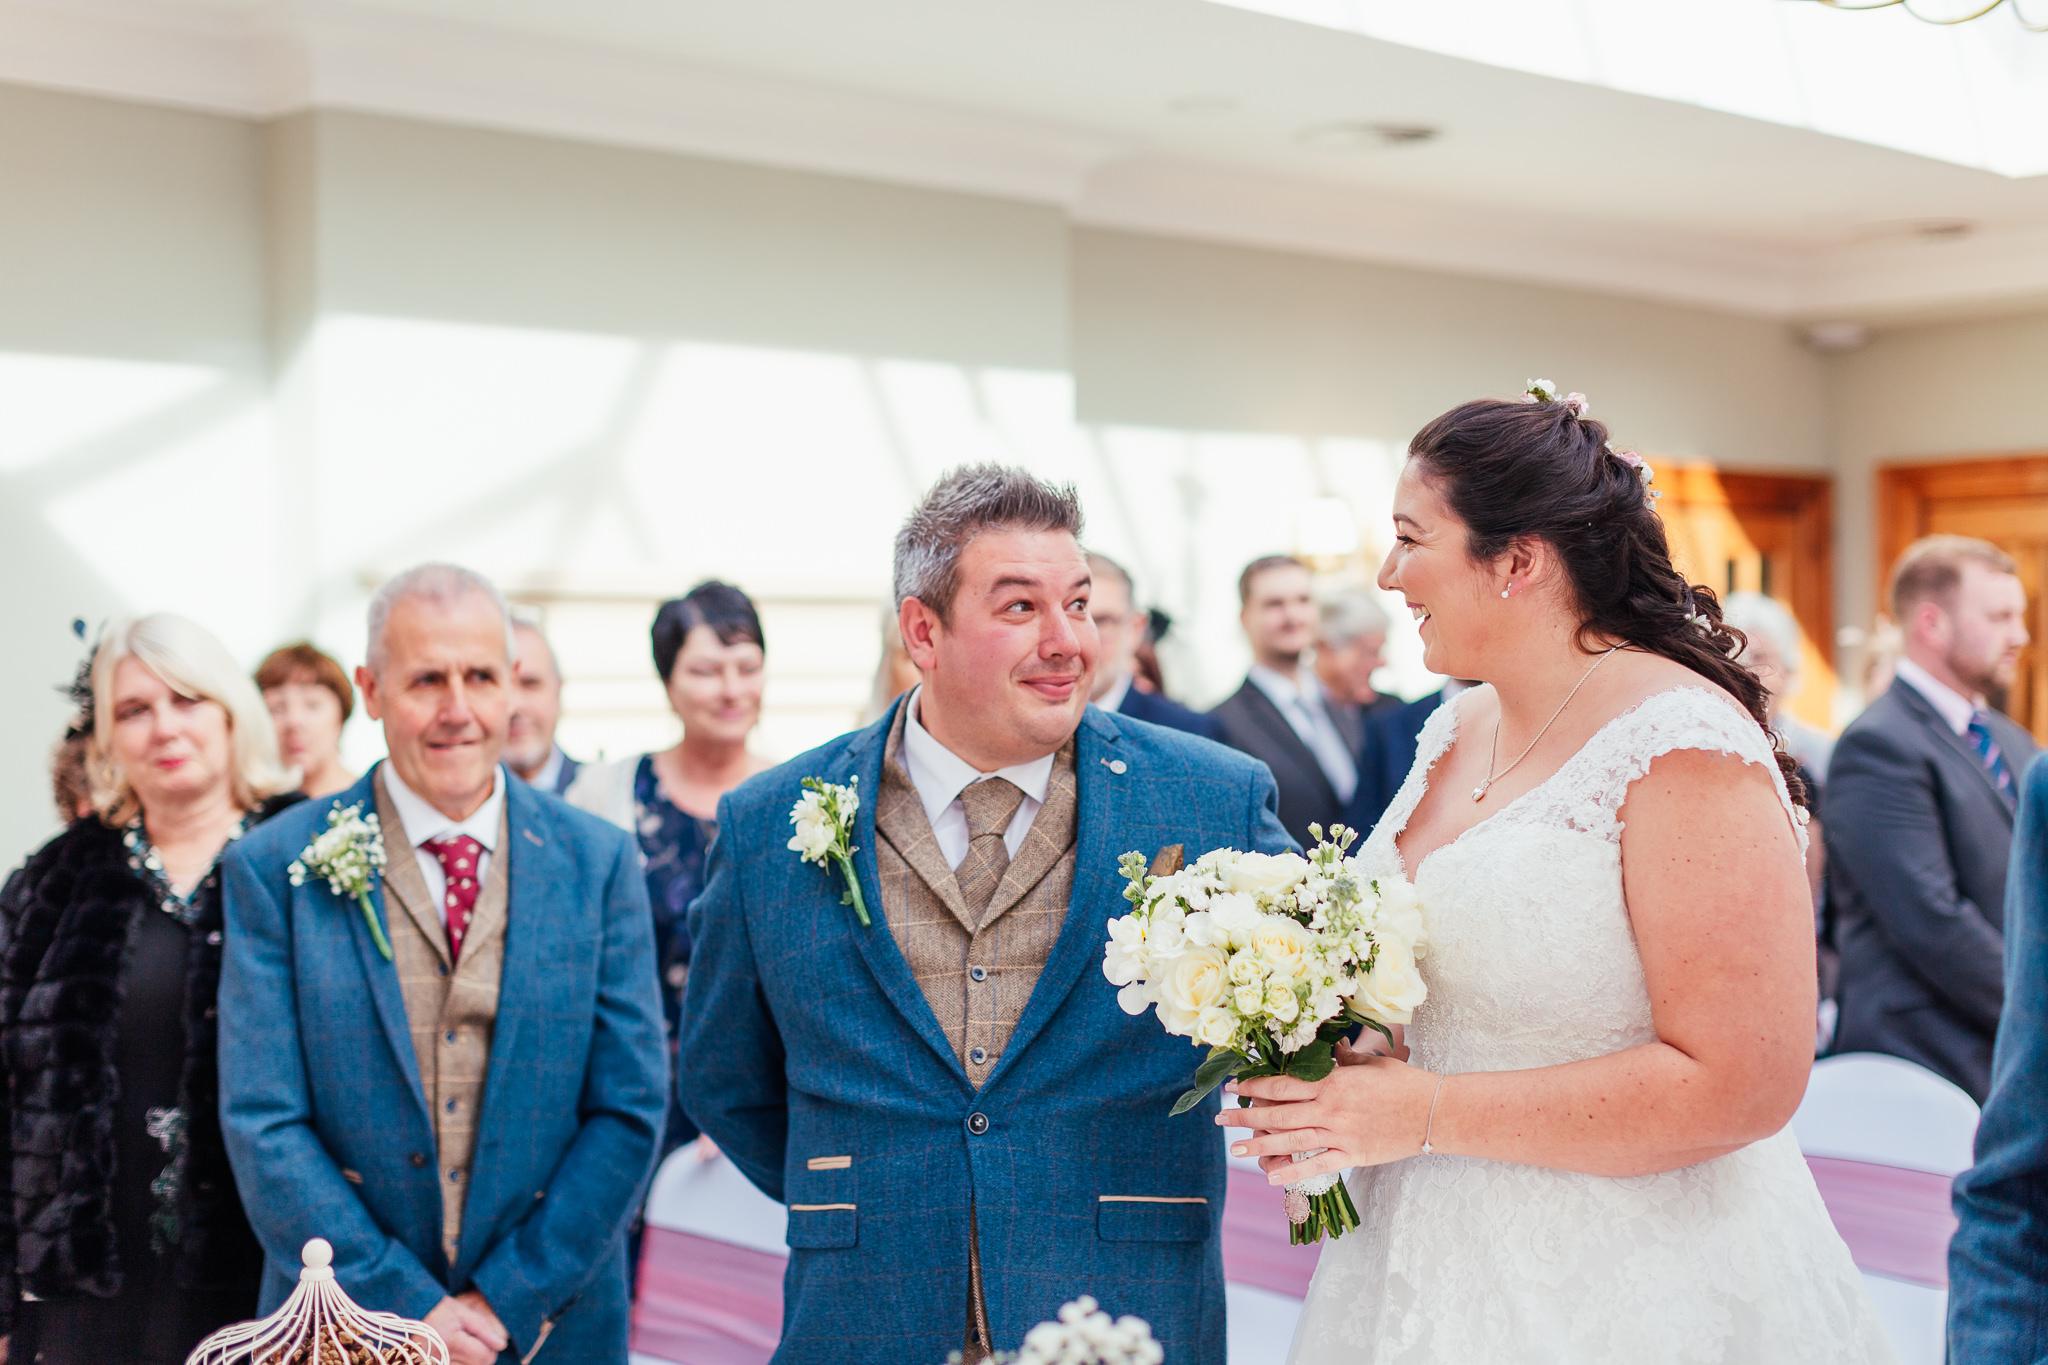 Willington-Hall-Cheshire-Wedding-13.jpg